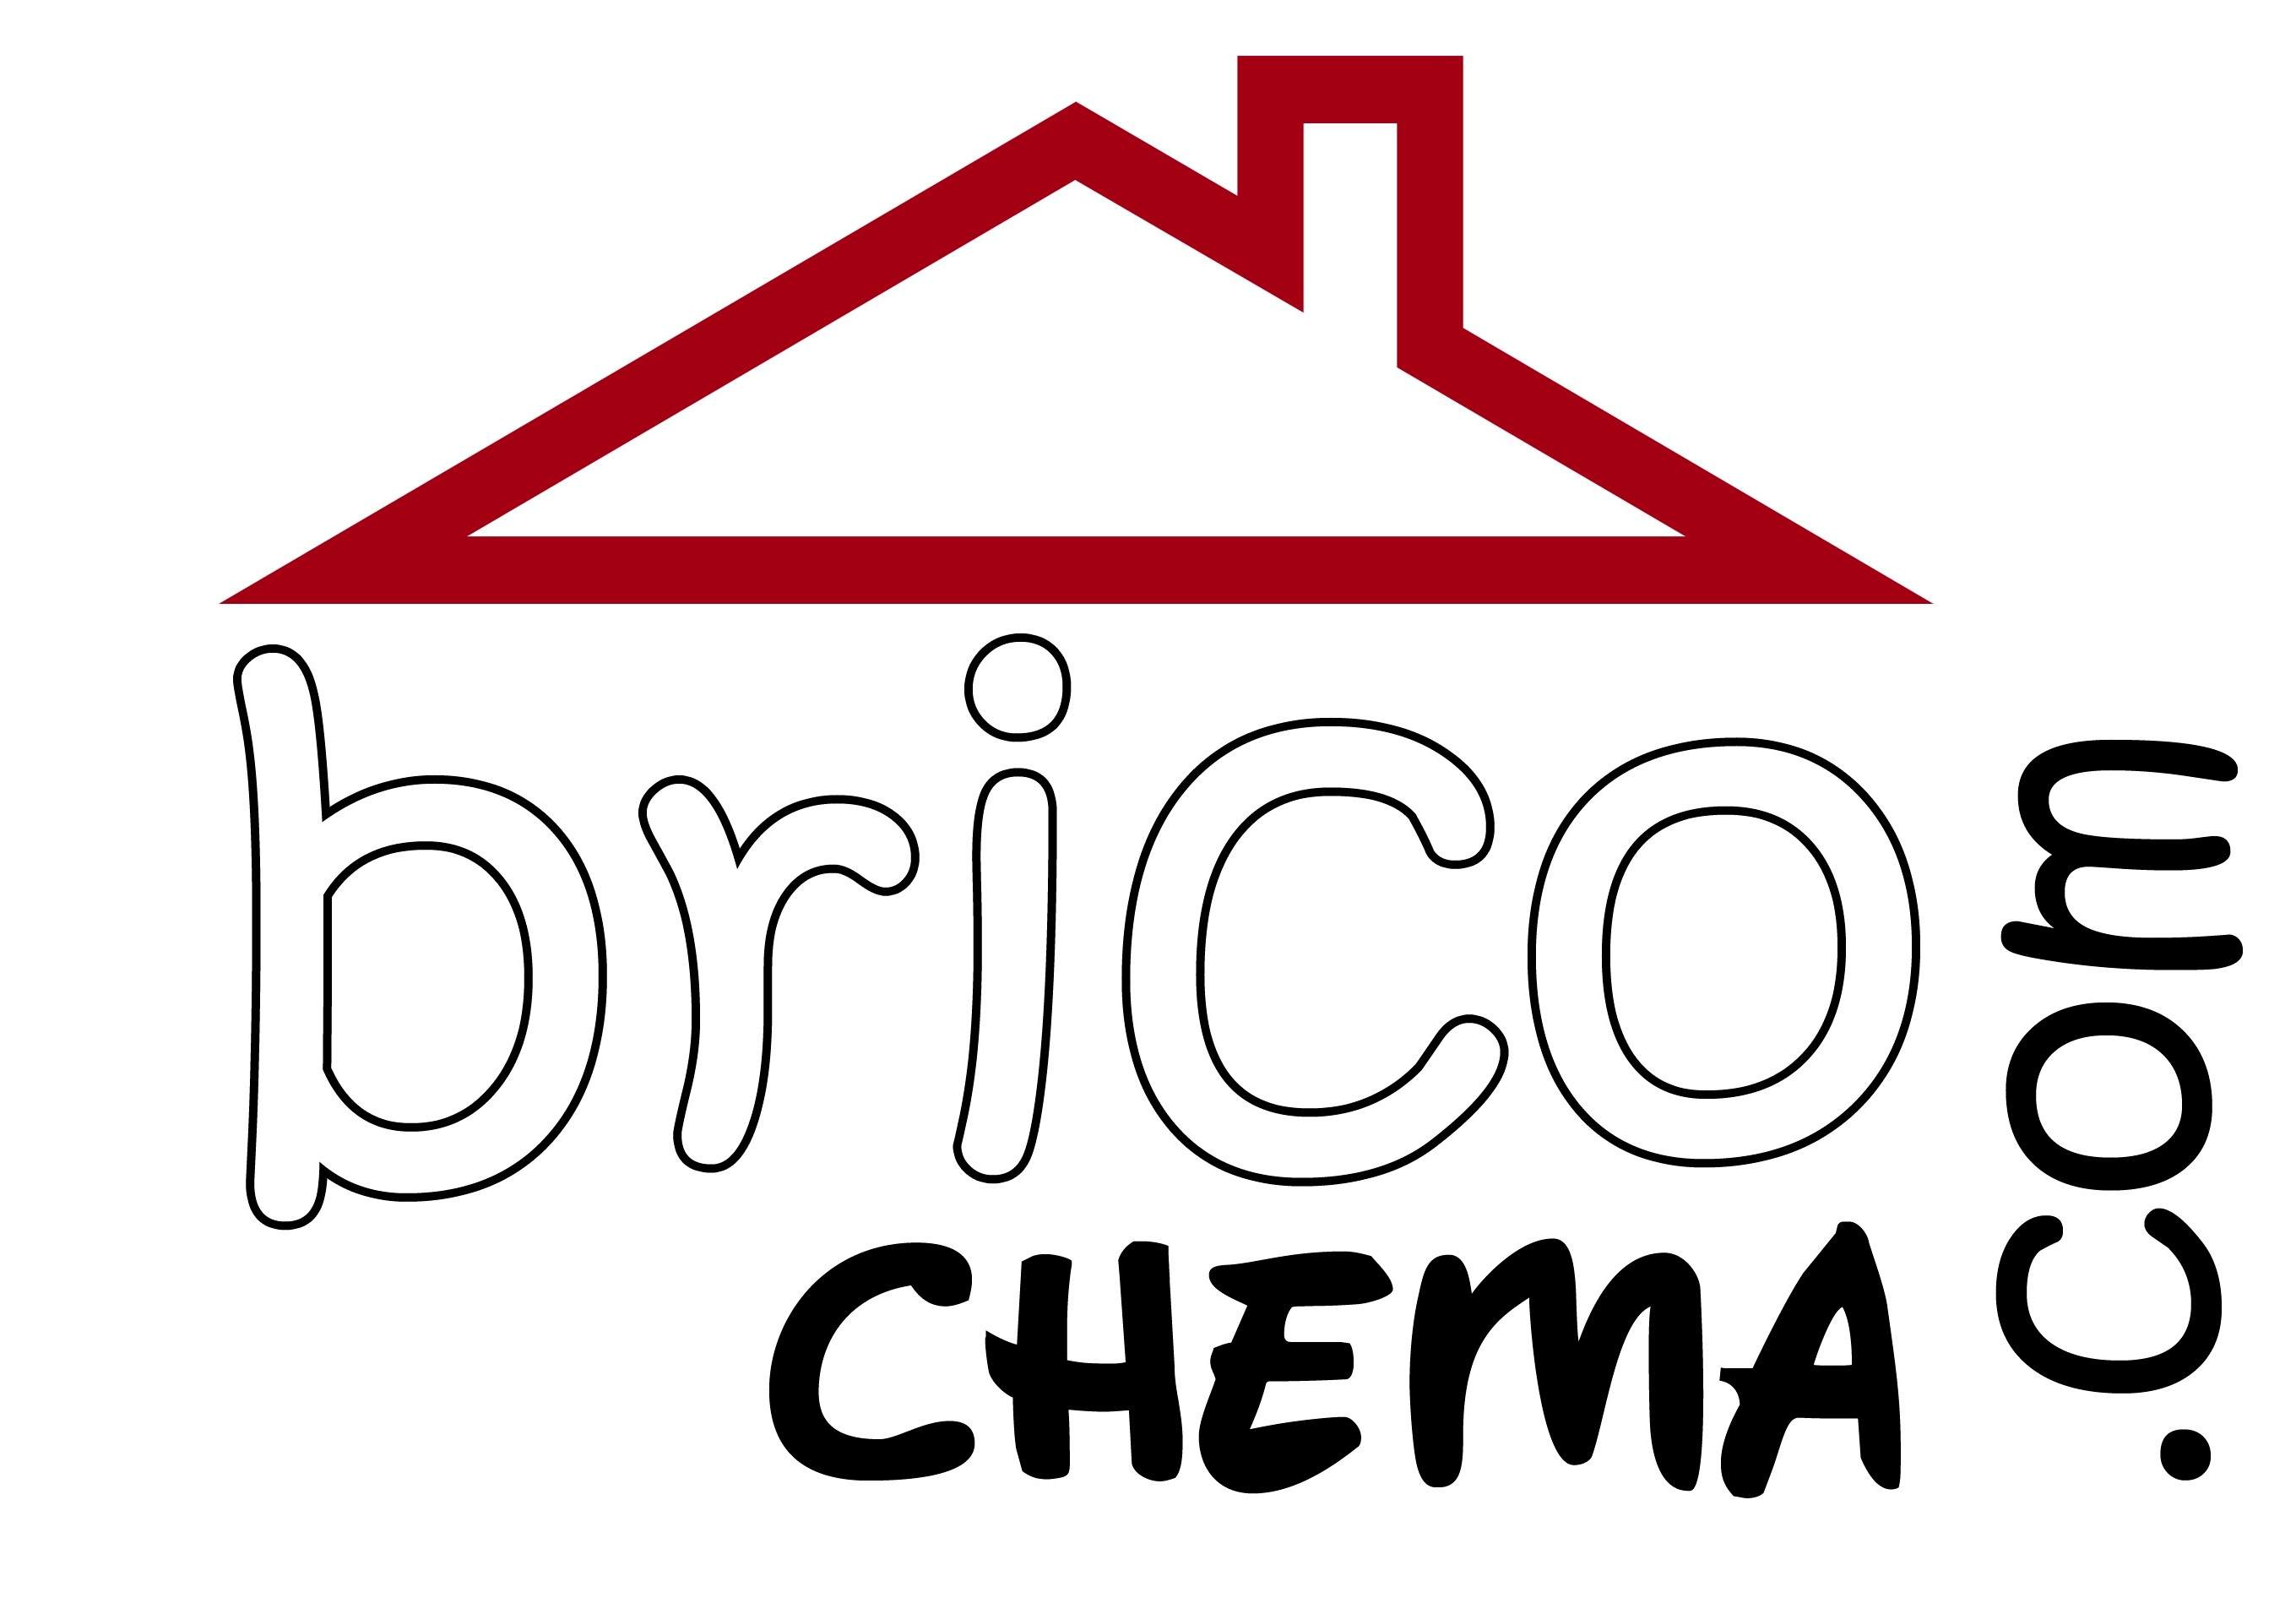 Bricochema.com